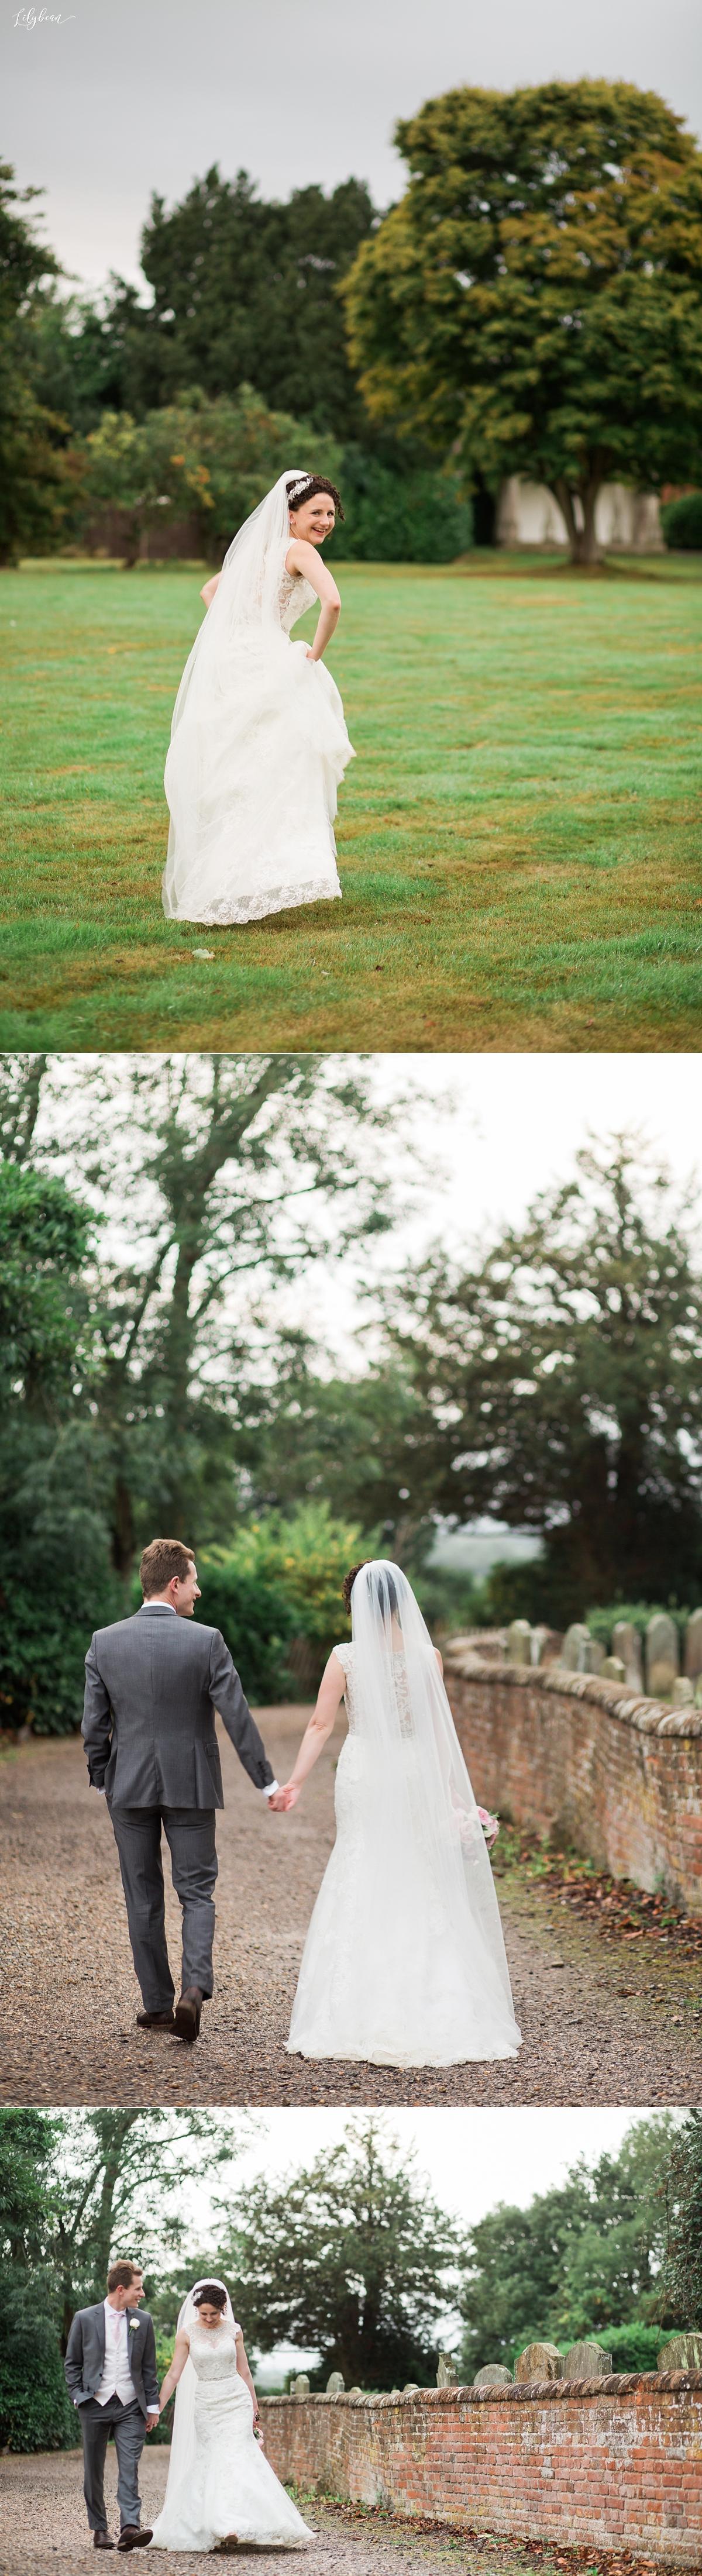 Casual walking shots of Bride & Groom